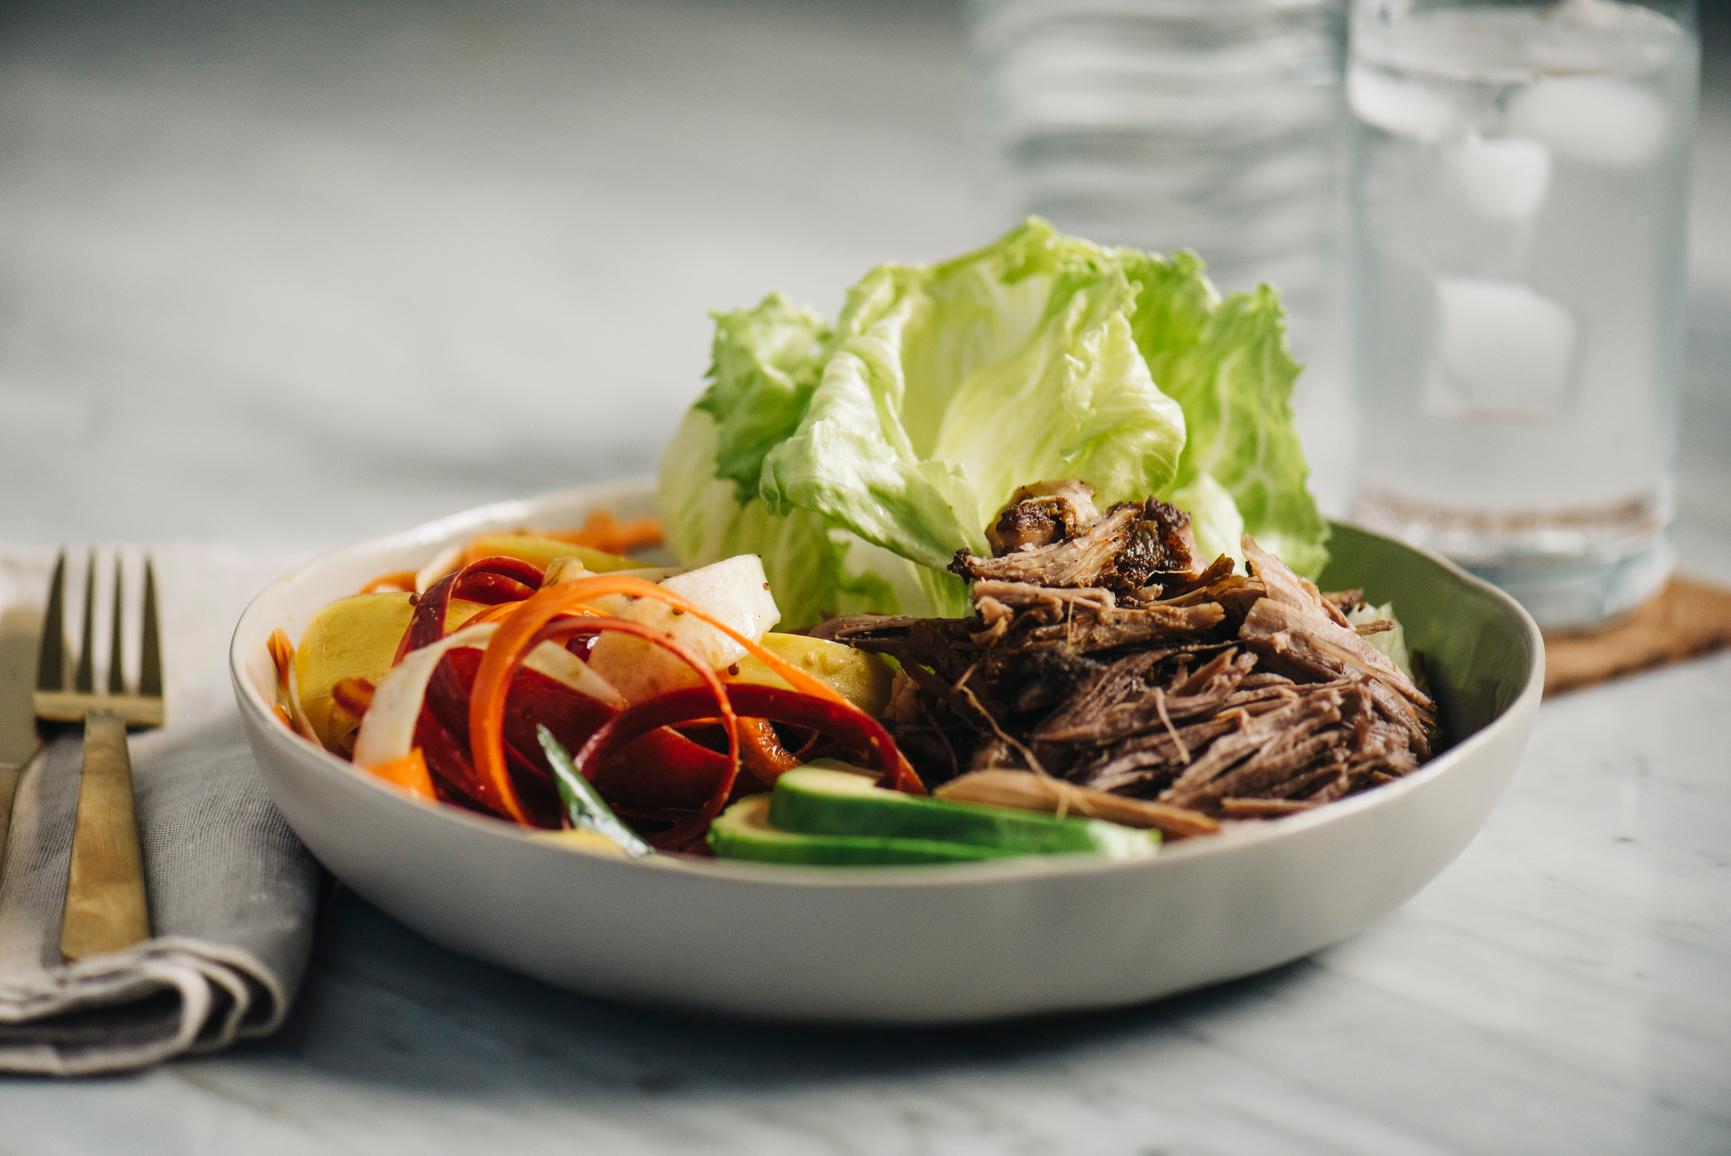 What's the best diet plan? USC doctors evaluate 4 popular trends